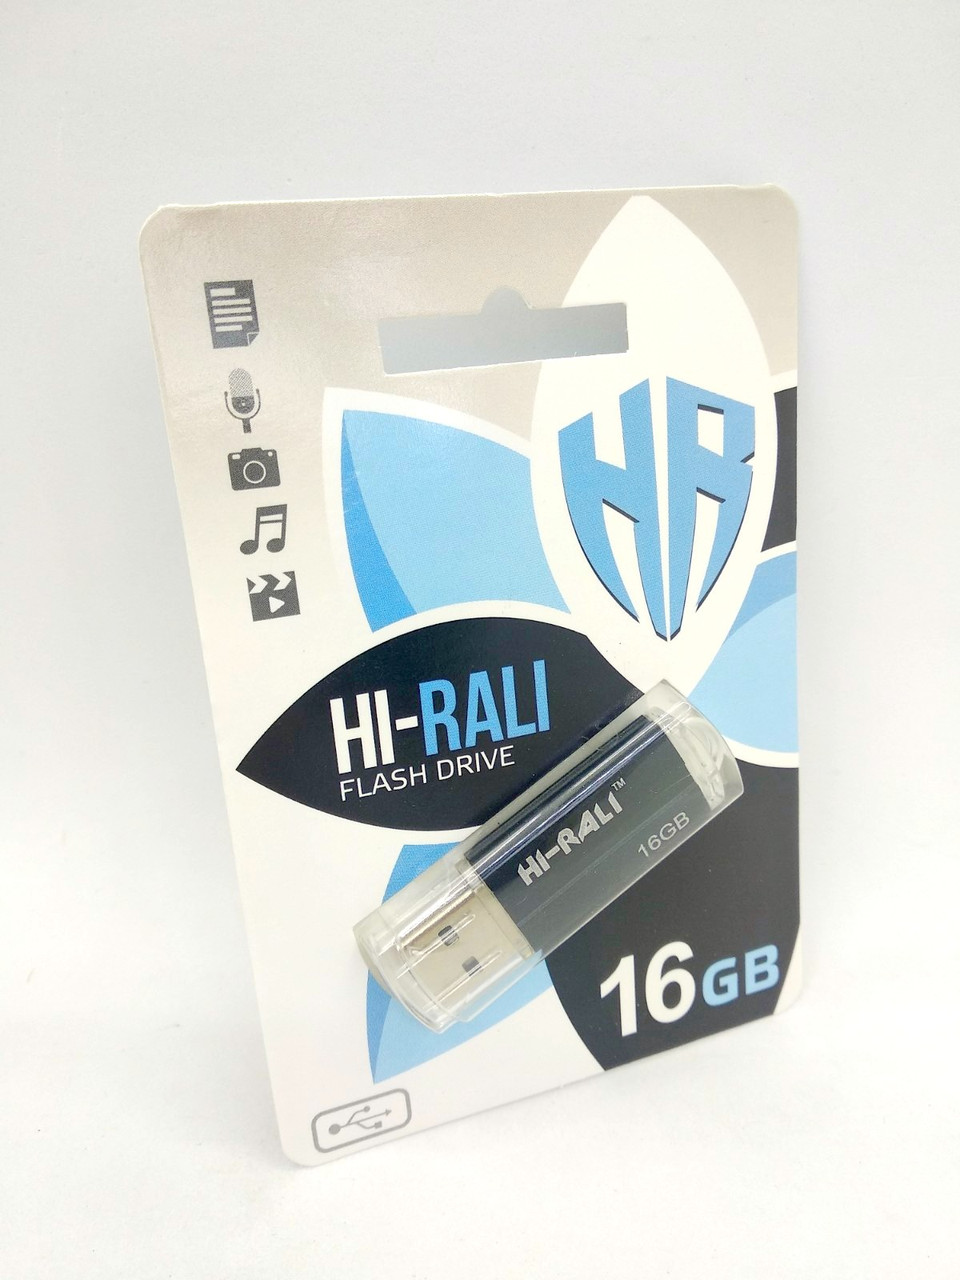 Флеш-накопитель Usb 16Gb Hi-Rali Corsair series Black